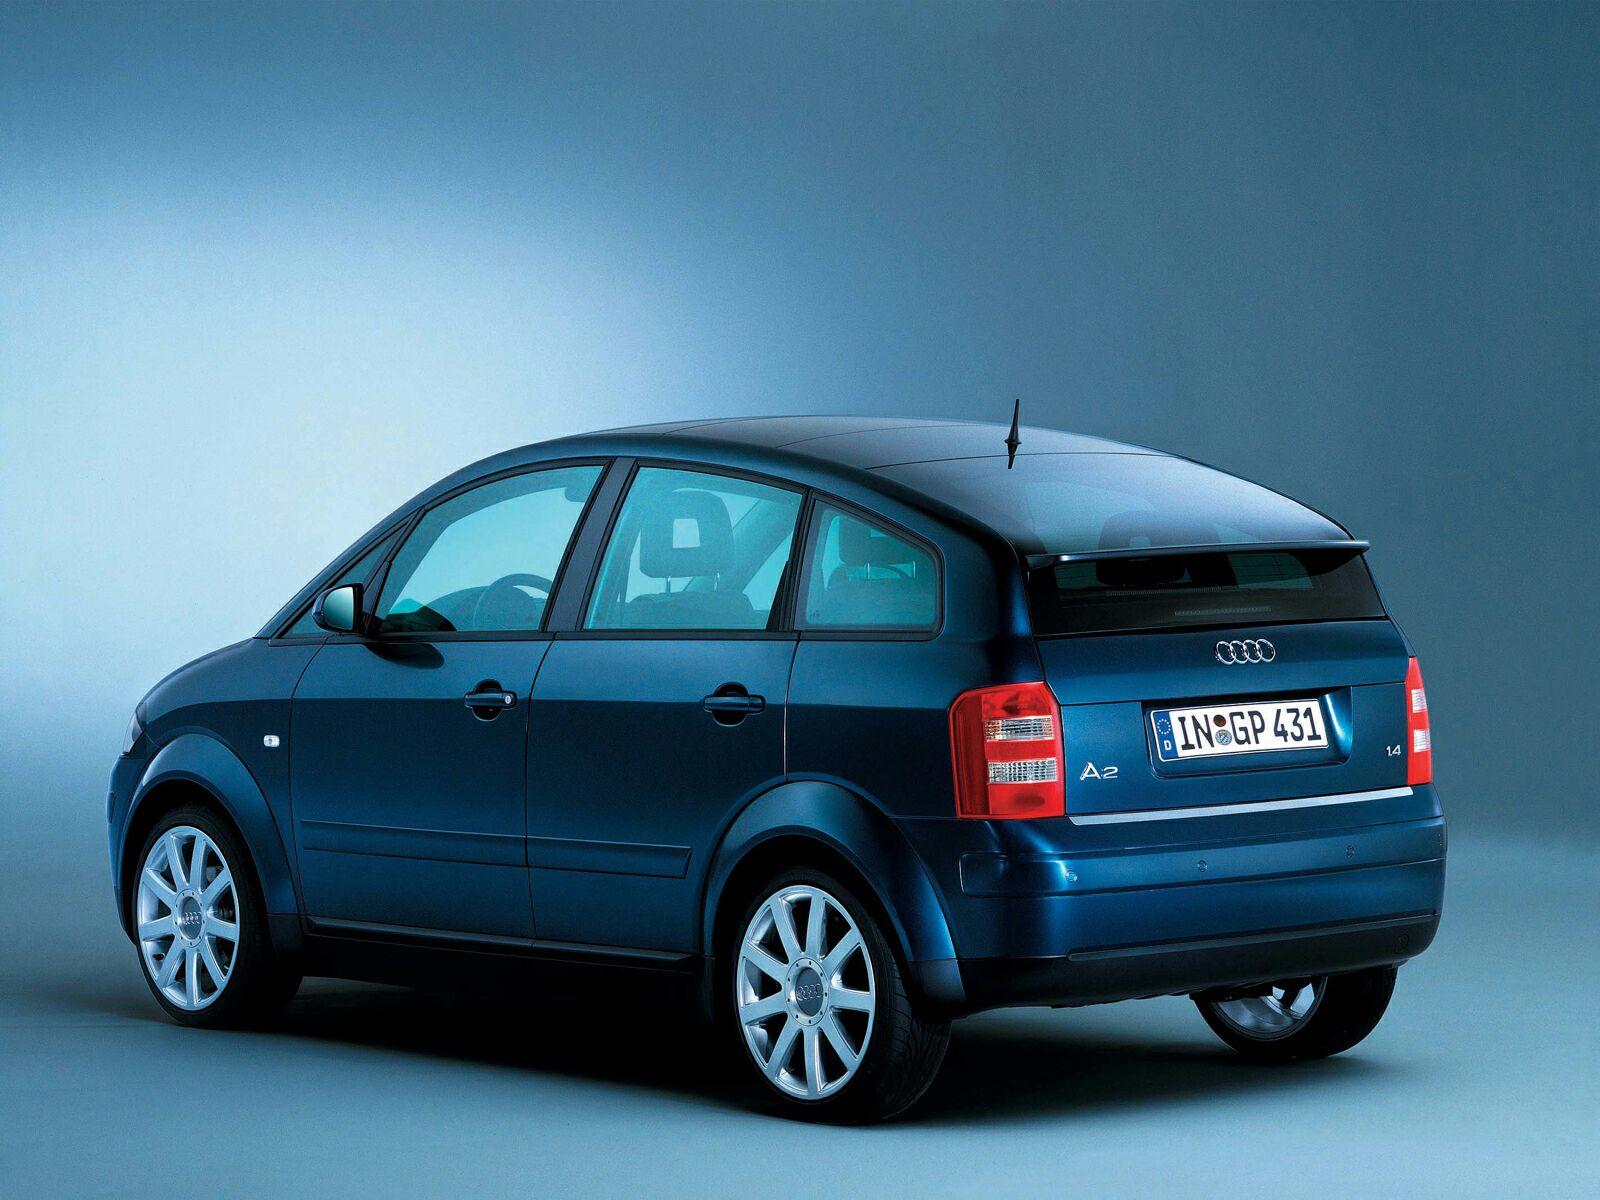 Audi-A2-2